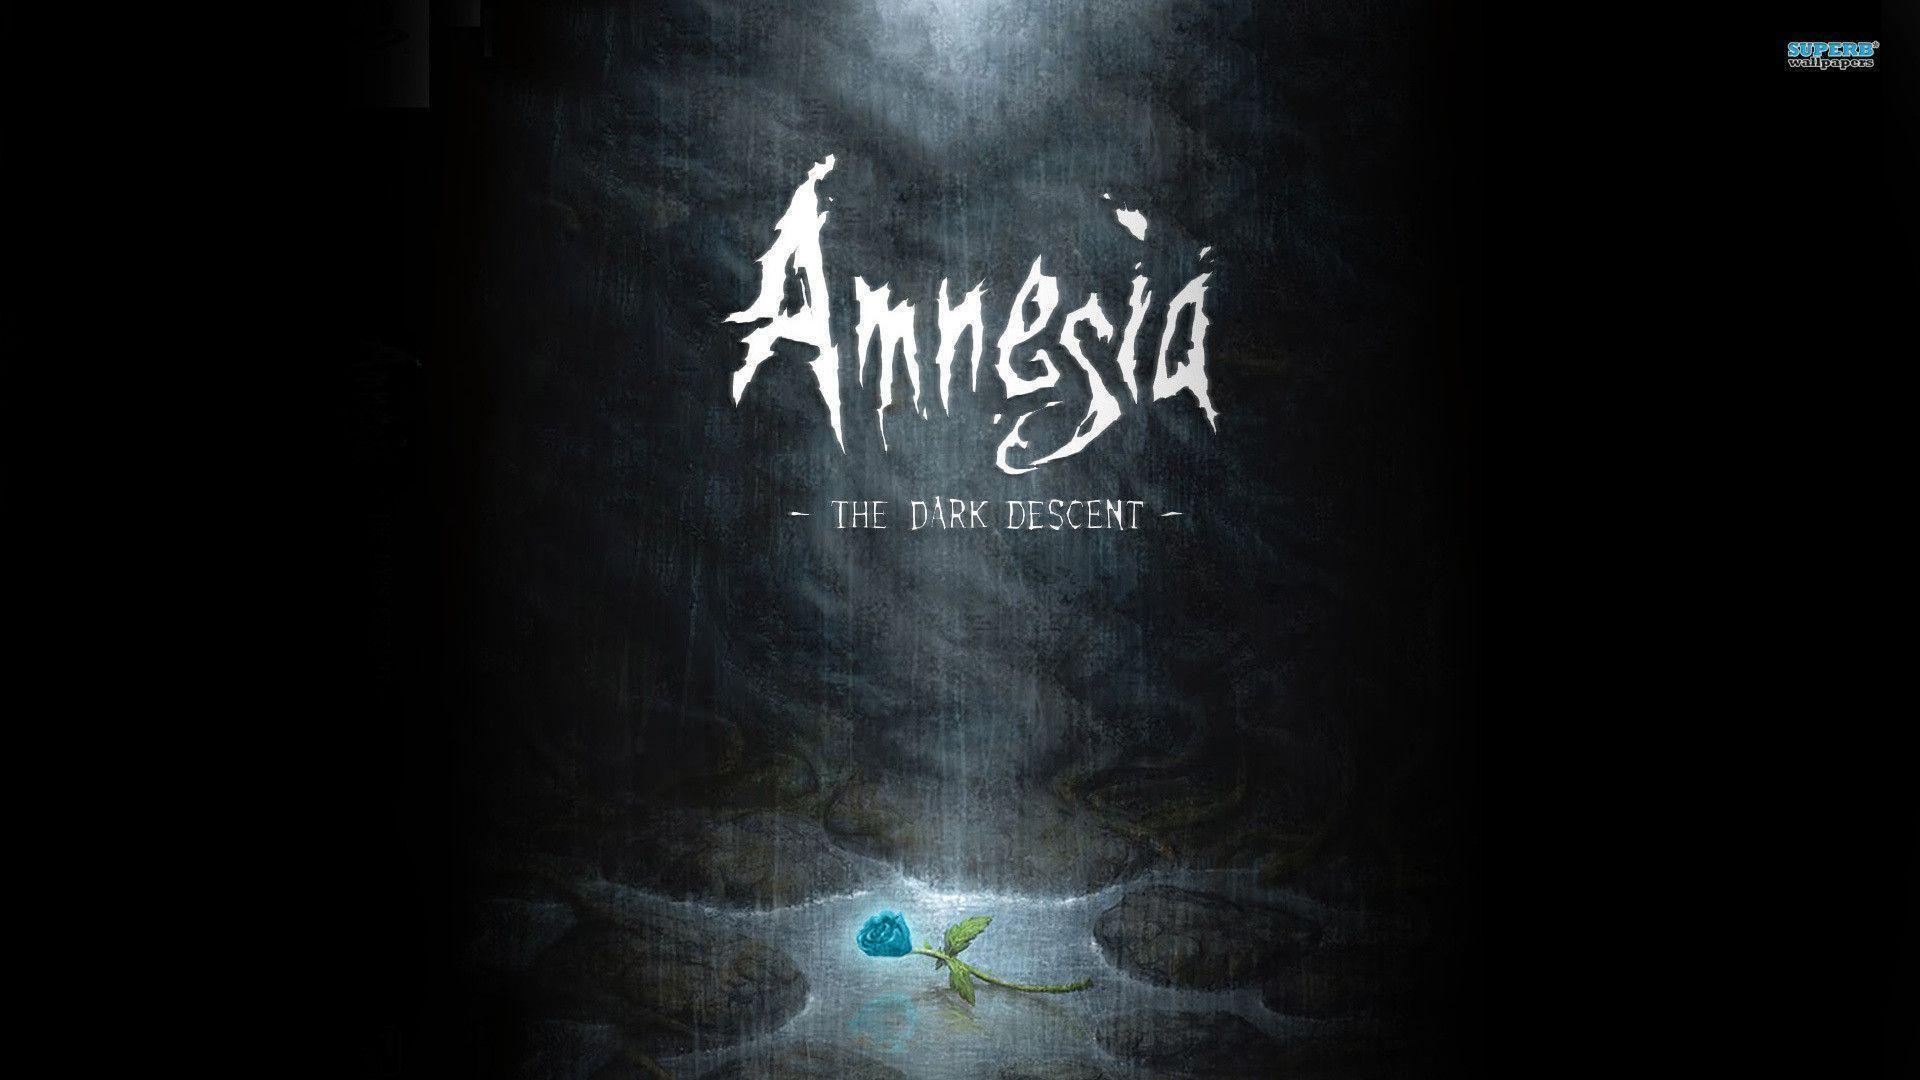 Amnesia The Dark Descent Wallpapers Wallpaper Cave